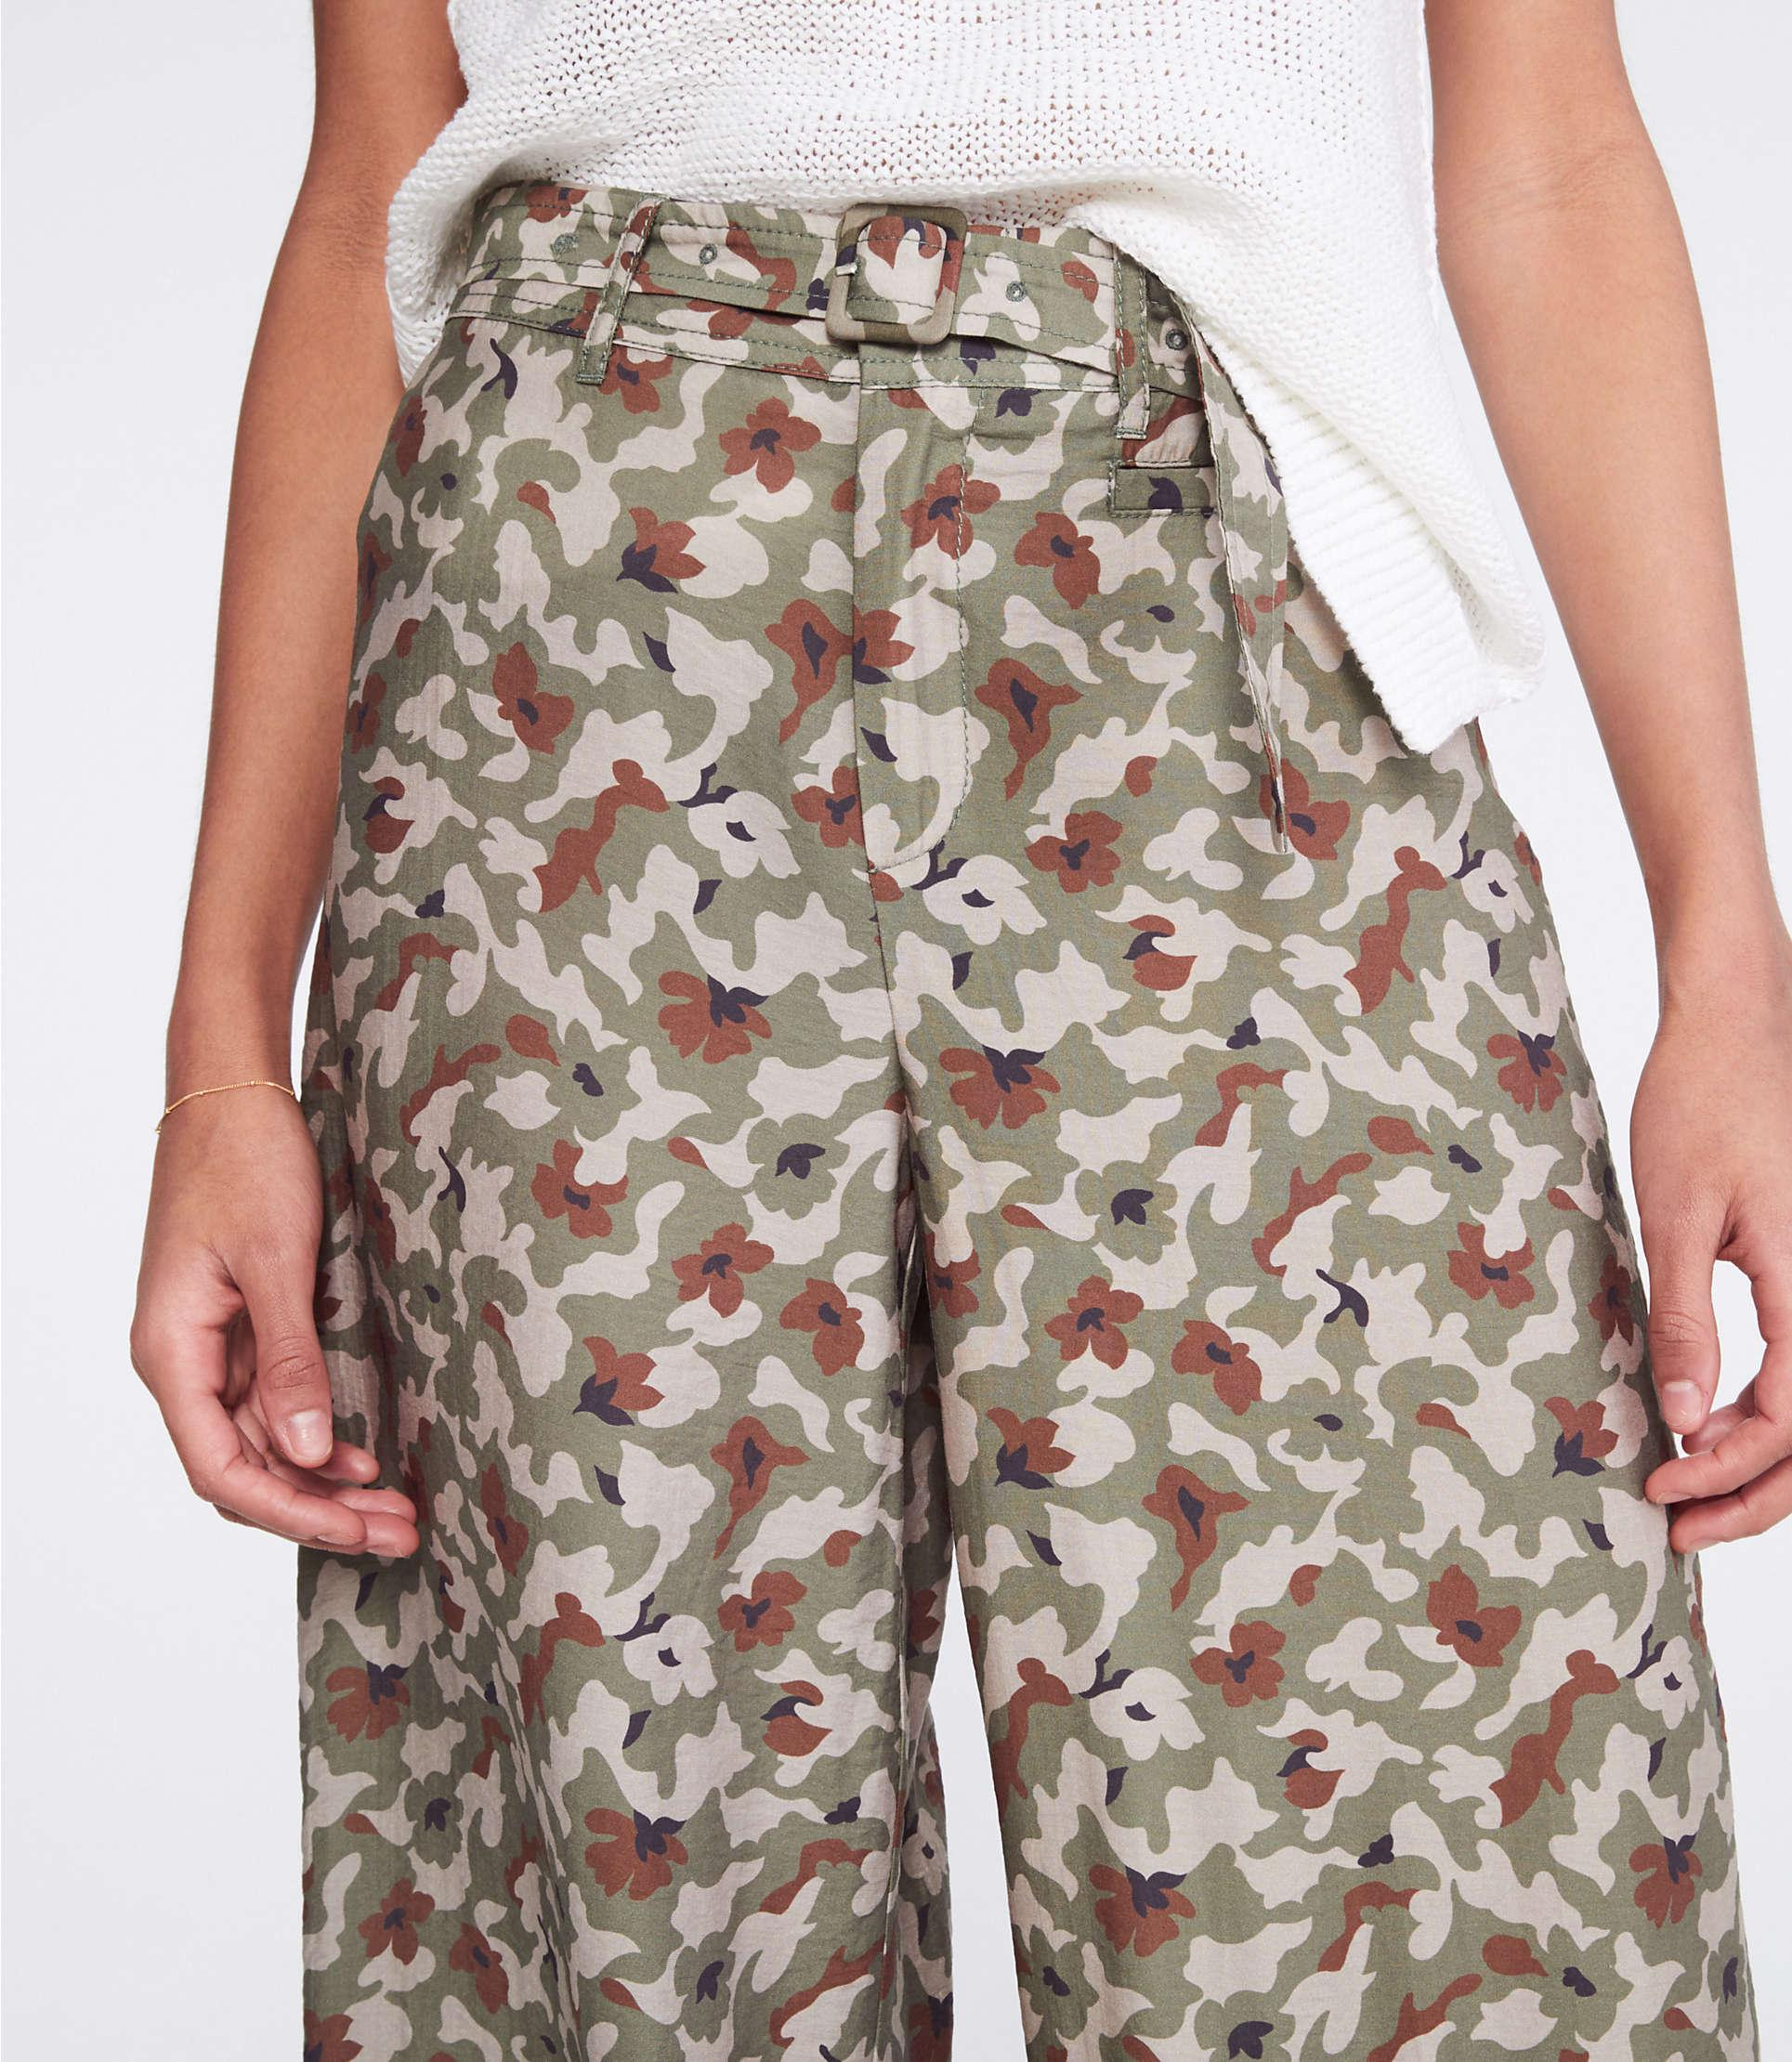 f8b19b94b8 Lou & Grey - Green Camo Belted High Rise Wide Leg Pants - Lyst. View  fullscreen